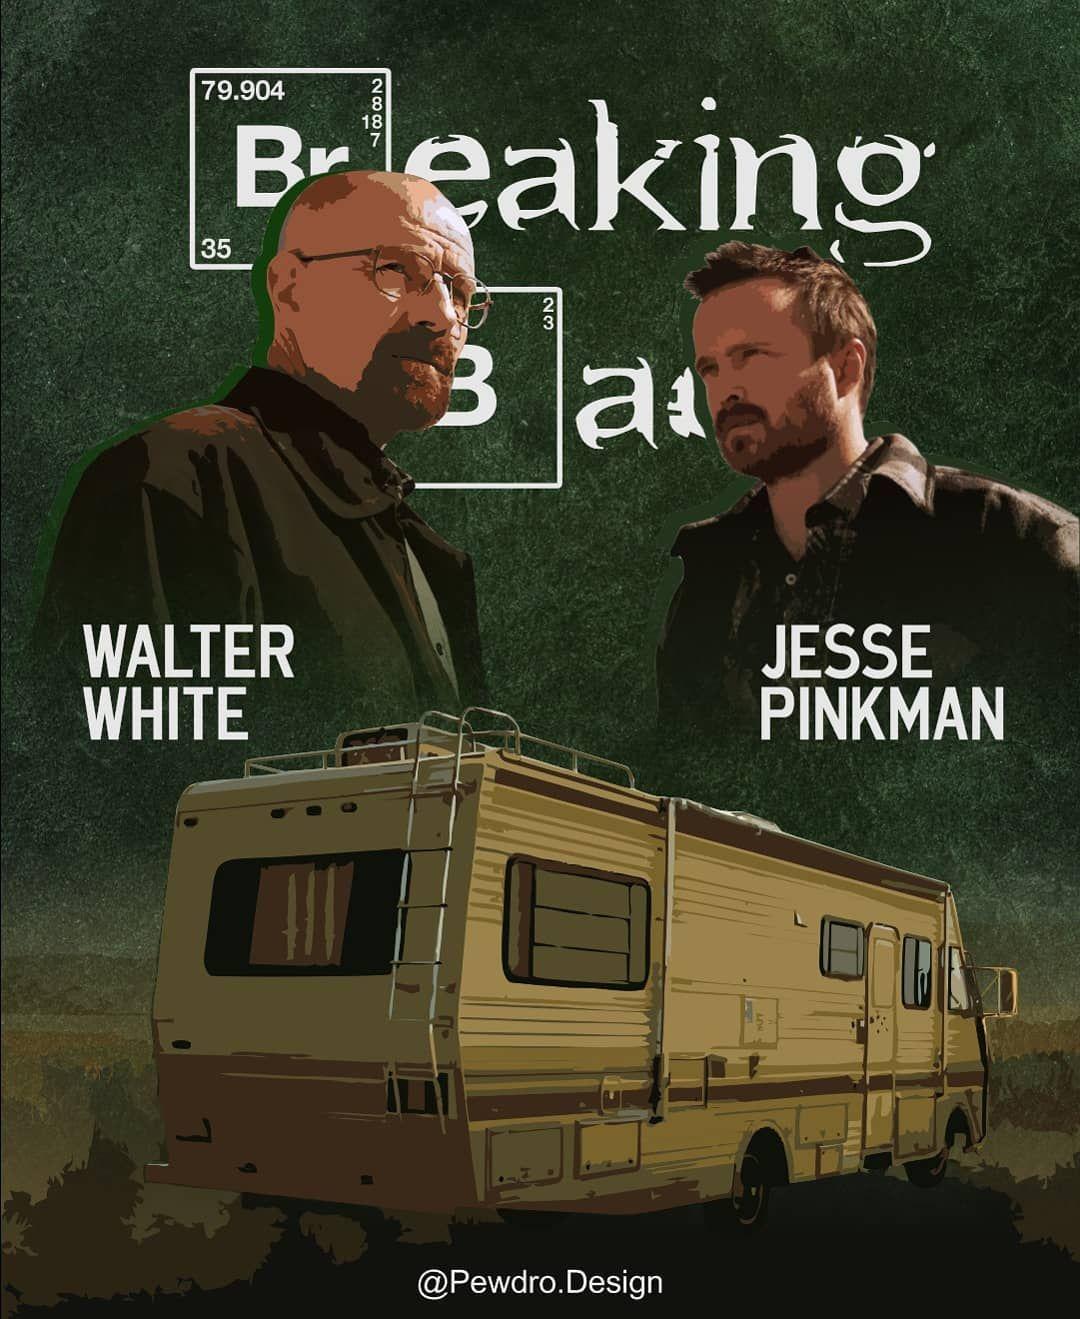 Breaking Bad Konusu Ve Oyunculari Maksatbilgi Breaking Bad Walter White Ordu